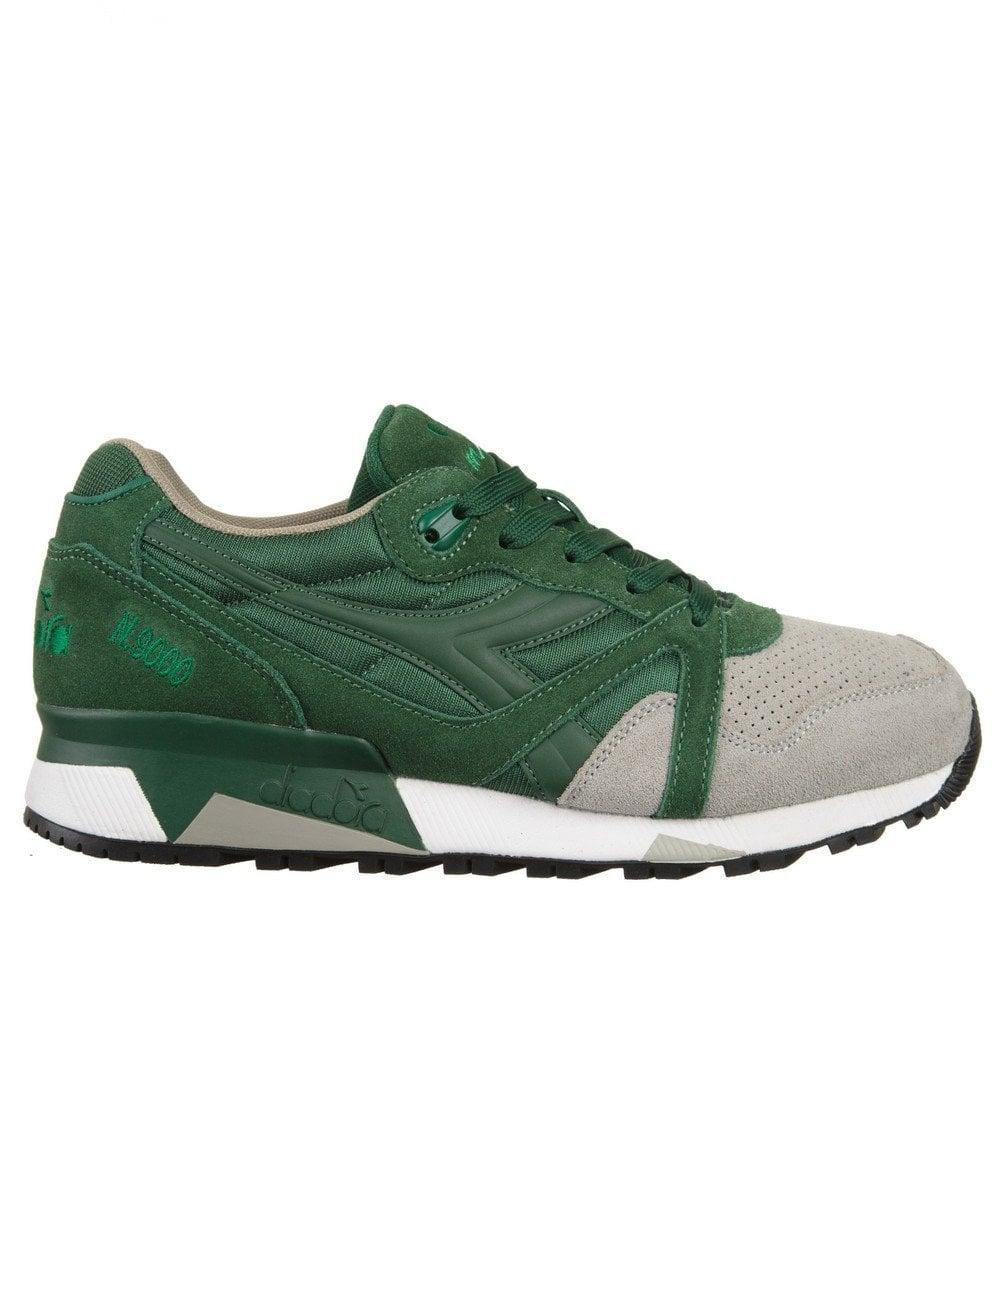 partecipazione Imitazione Auroch  Diadora N9000 Trainers - (Double Pack) Foliage Green/Paloma Grey - Footwear  from Fat Buddha Store UK